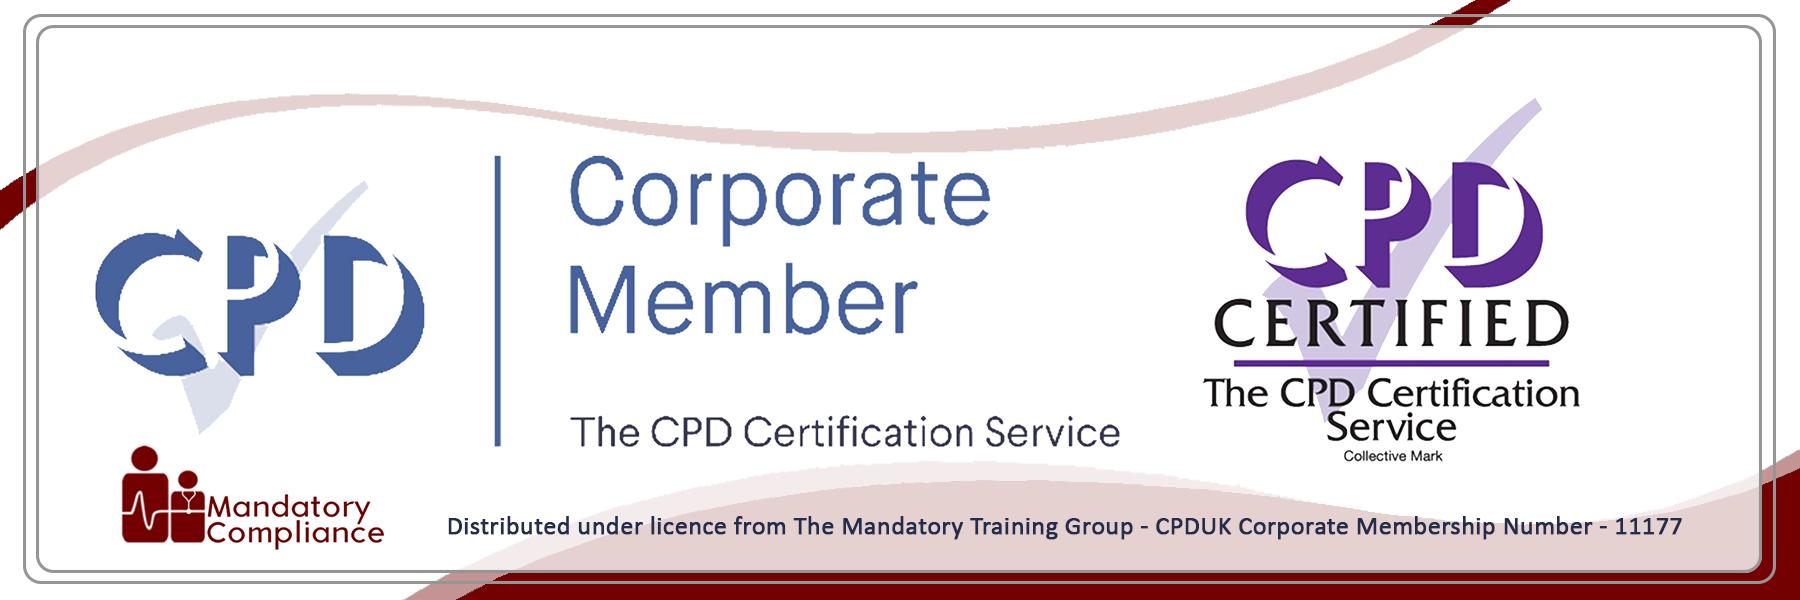 Human Resource Management - Online Training Course - CPDUK Accredited - Mandatory Compliance UK -